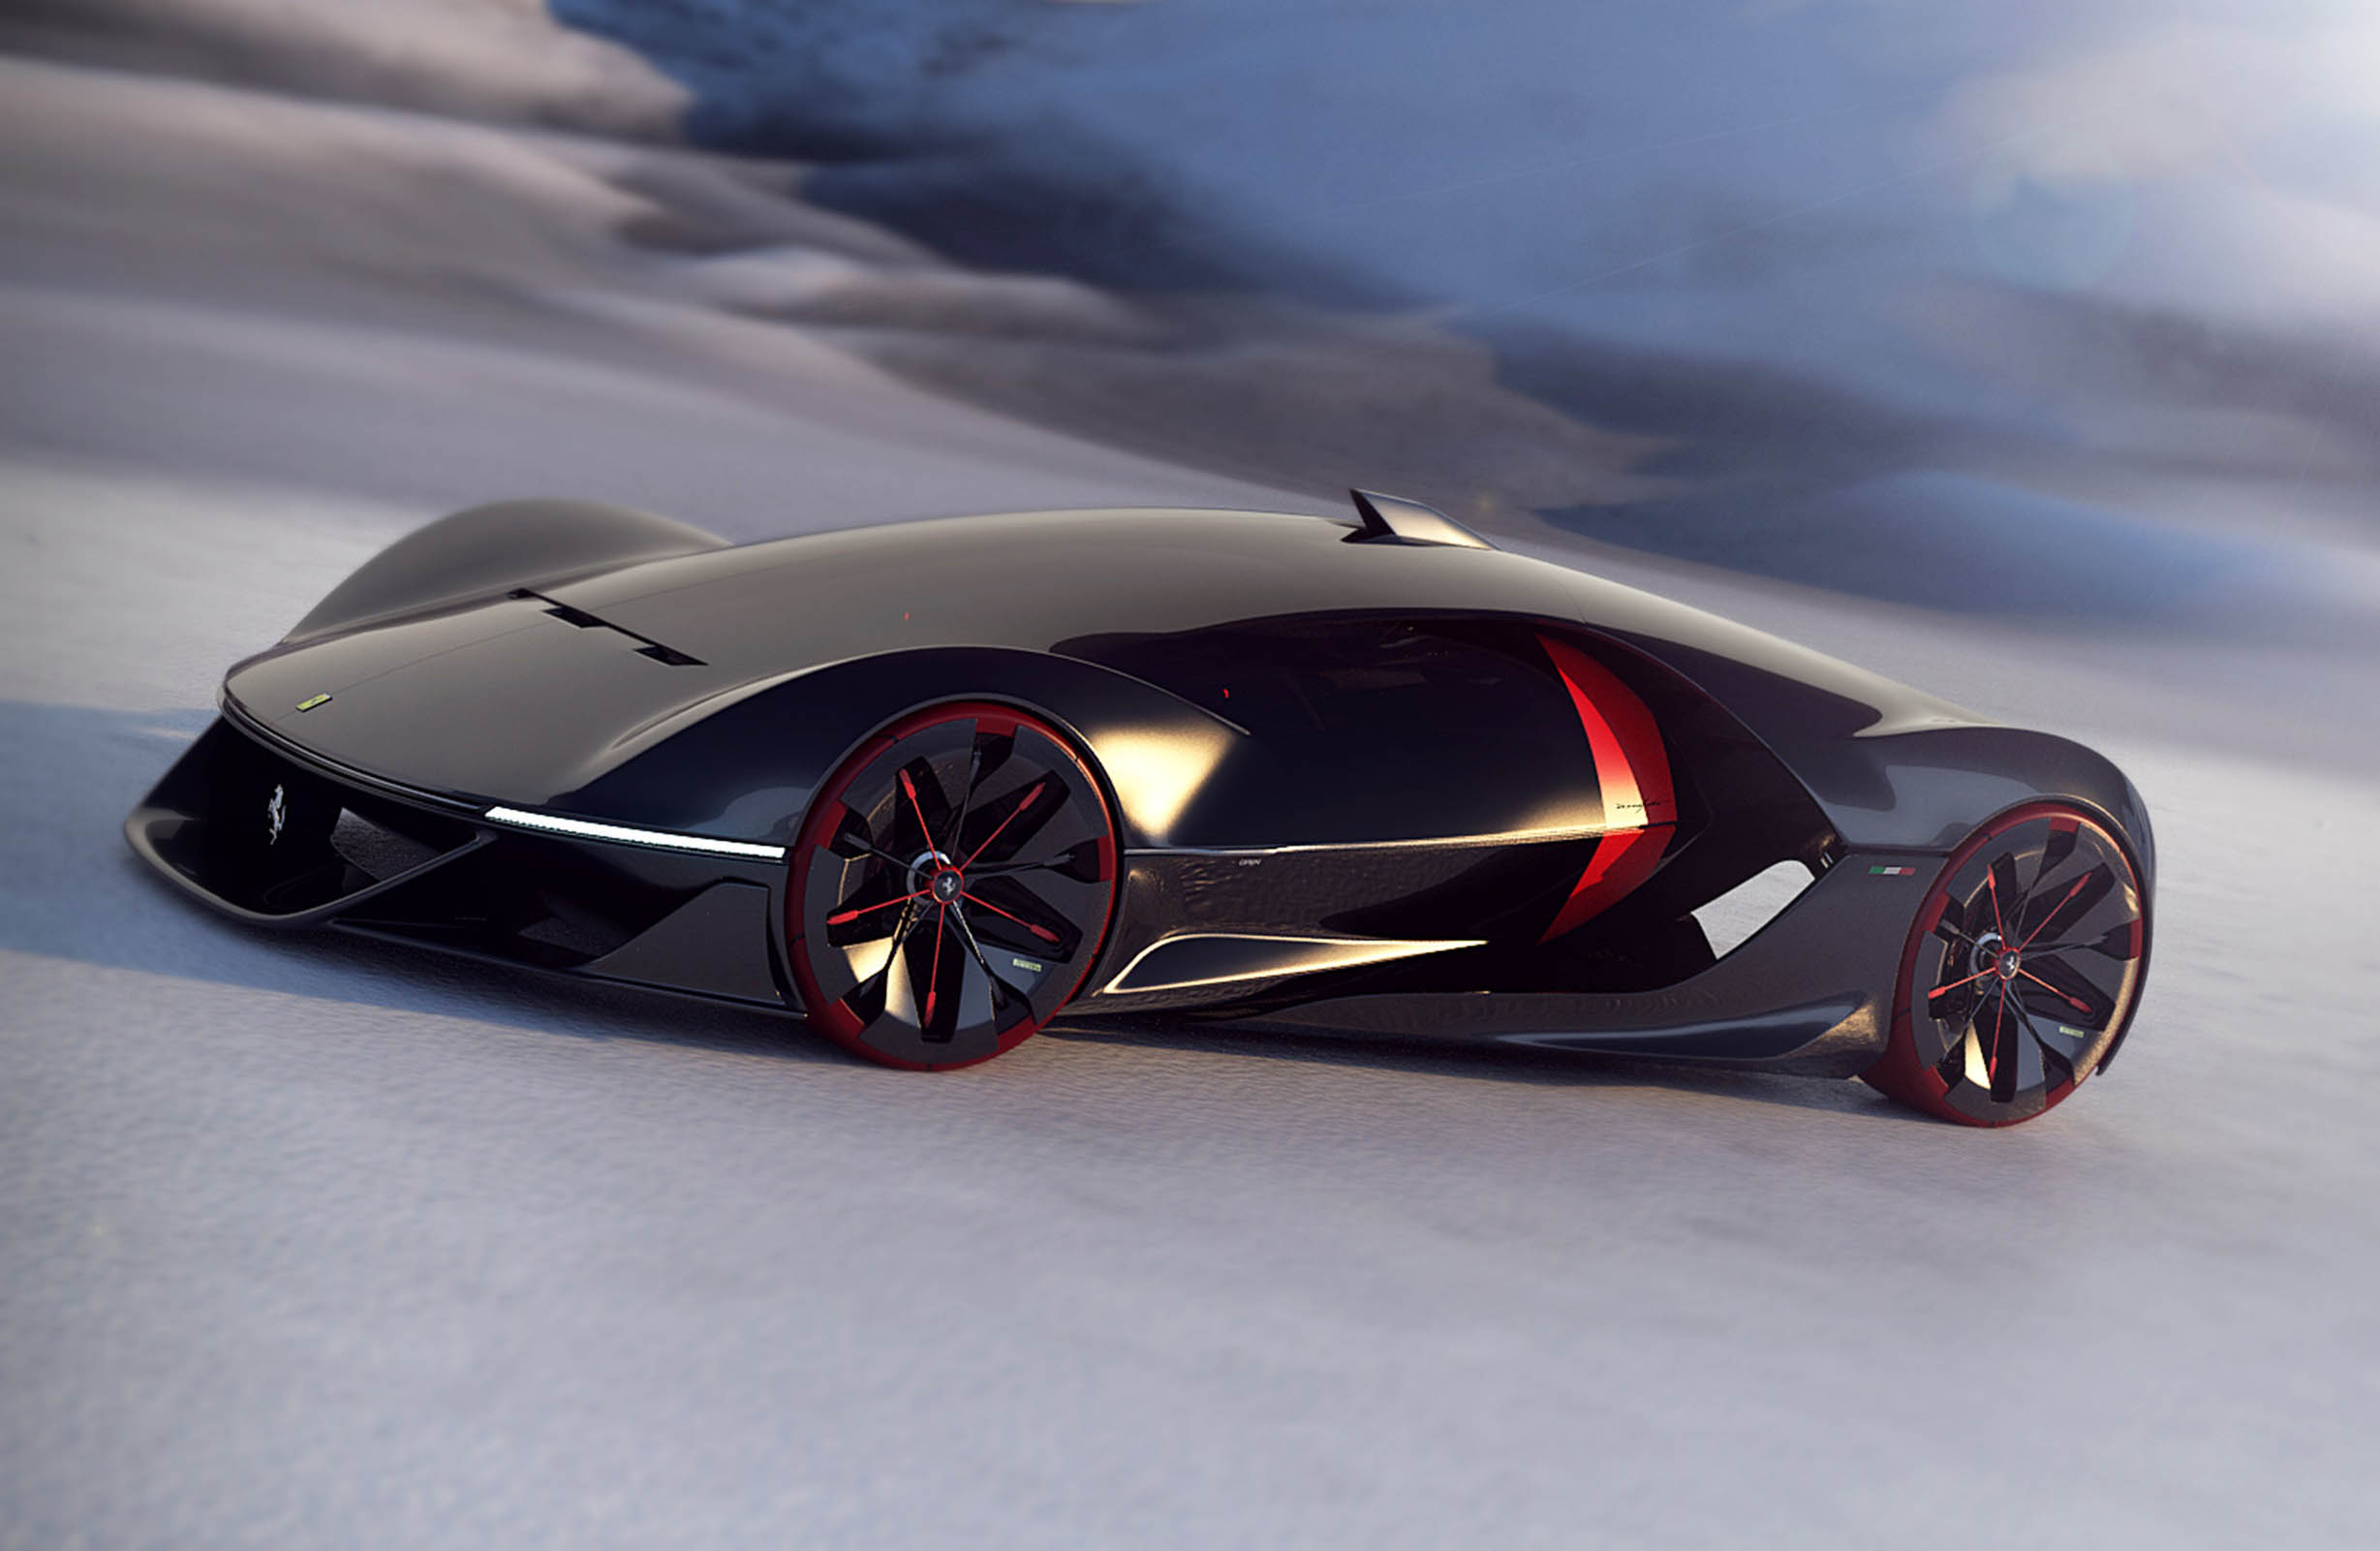 160031 Car Ferrari  Concorso Design GranPremio_Manifesto_Barthly Kalyvianakis Gervex Oleksiak Epinat Stock_Image1